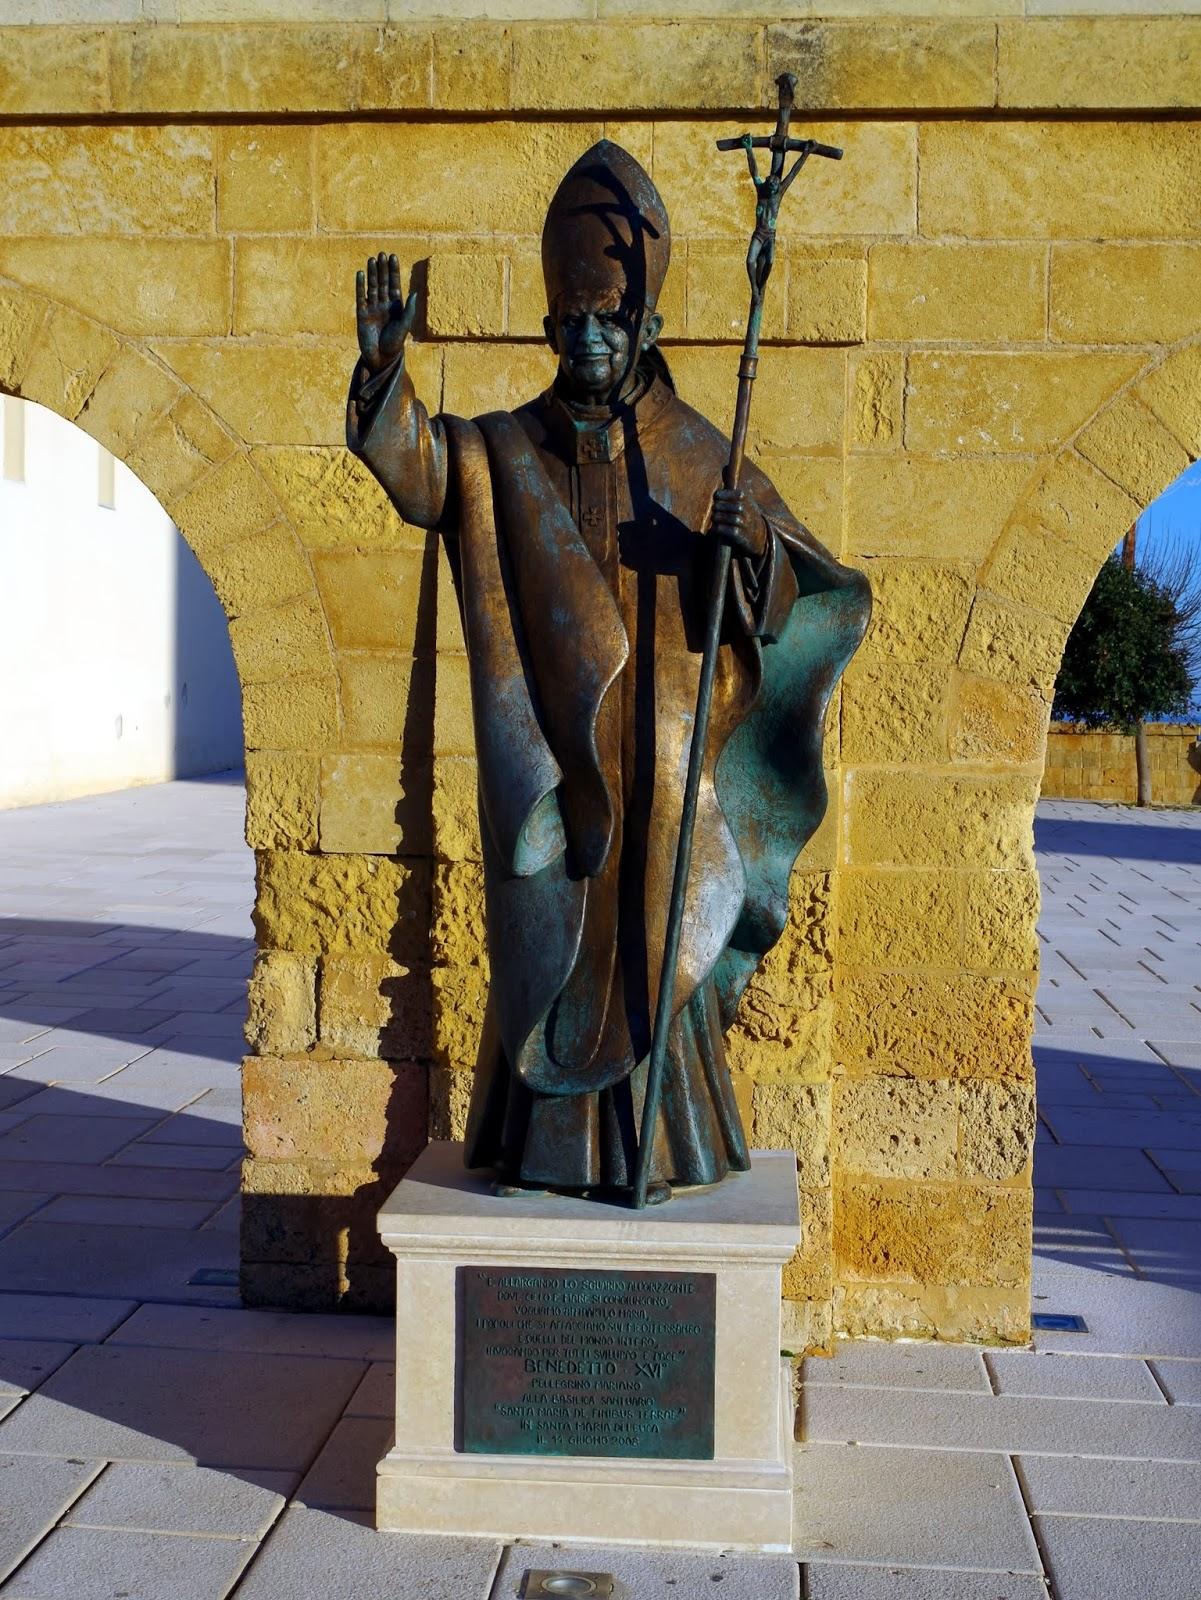 Bronzestatue Papst Benedikt XVI in Santa Maria di Leuca (Apulien)